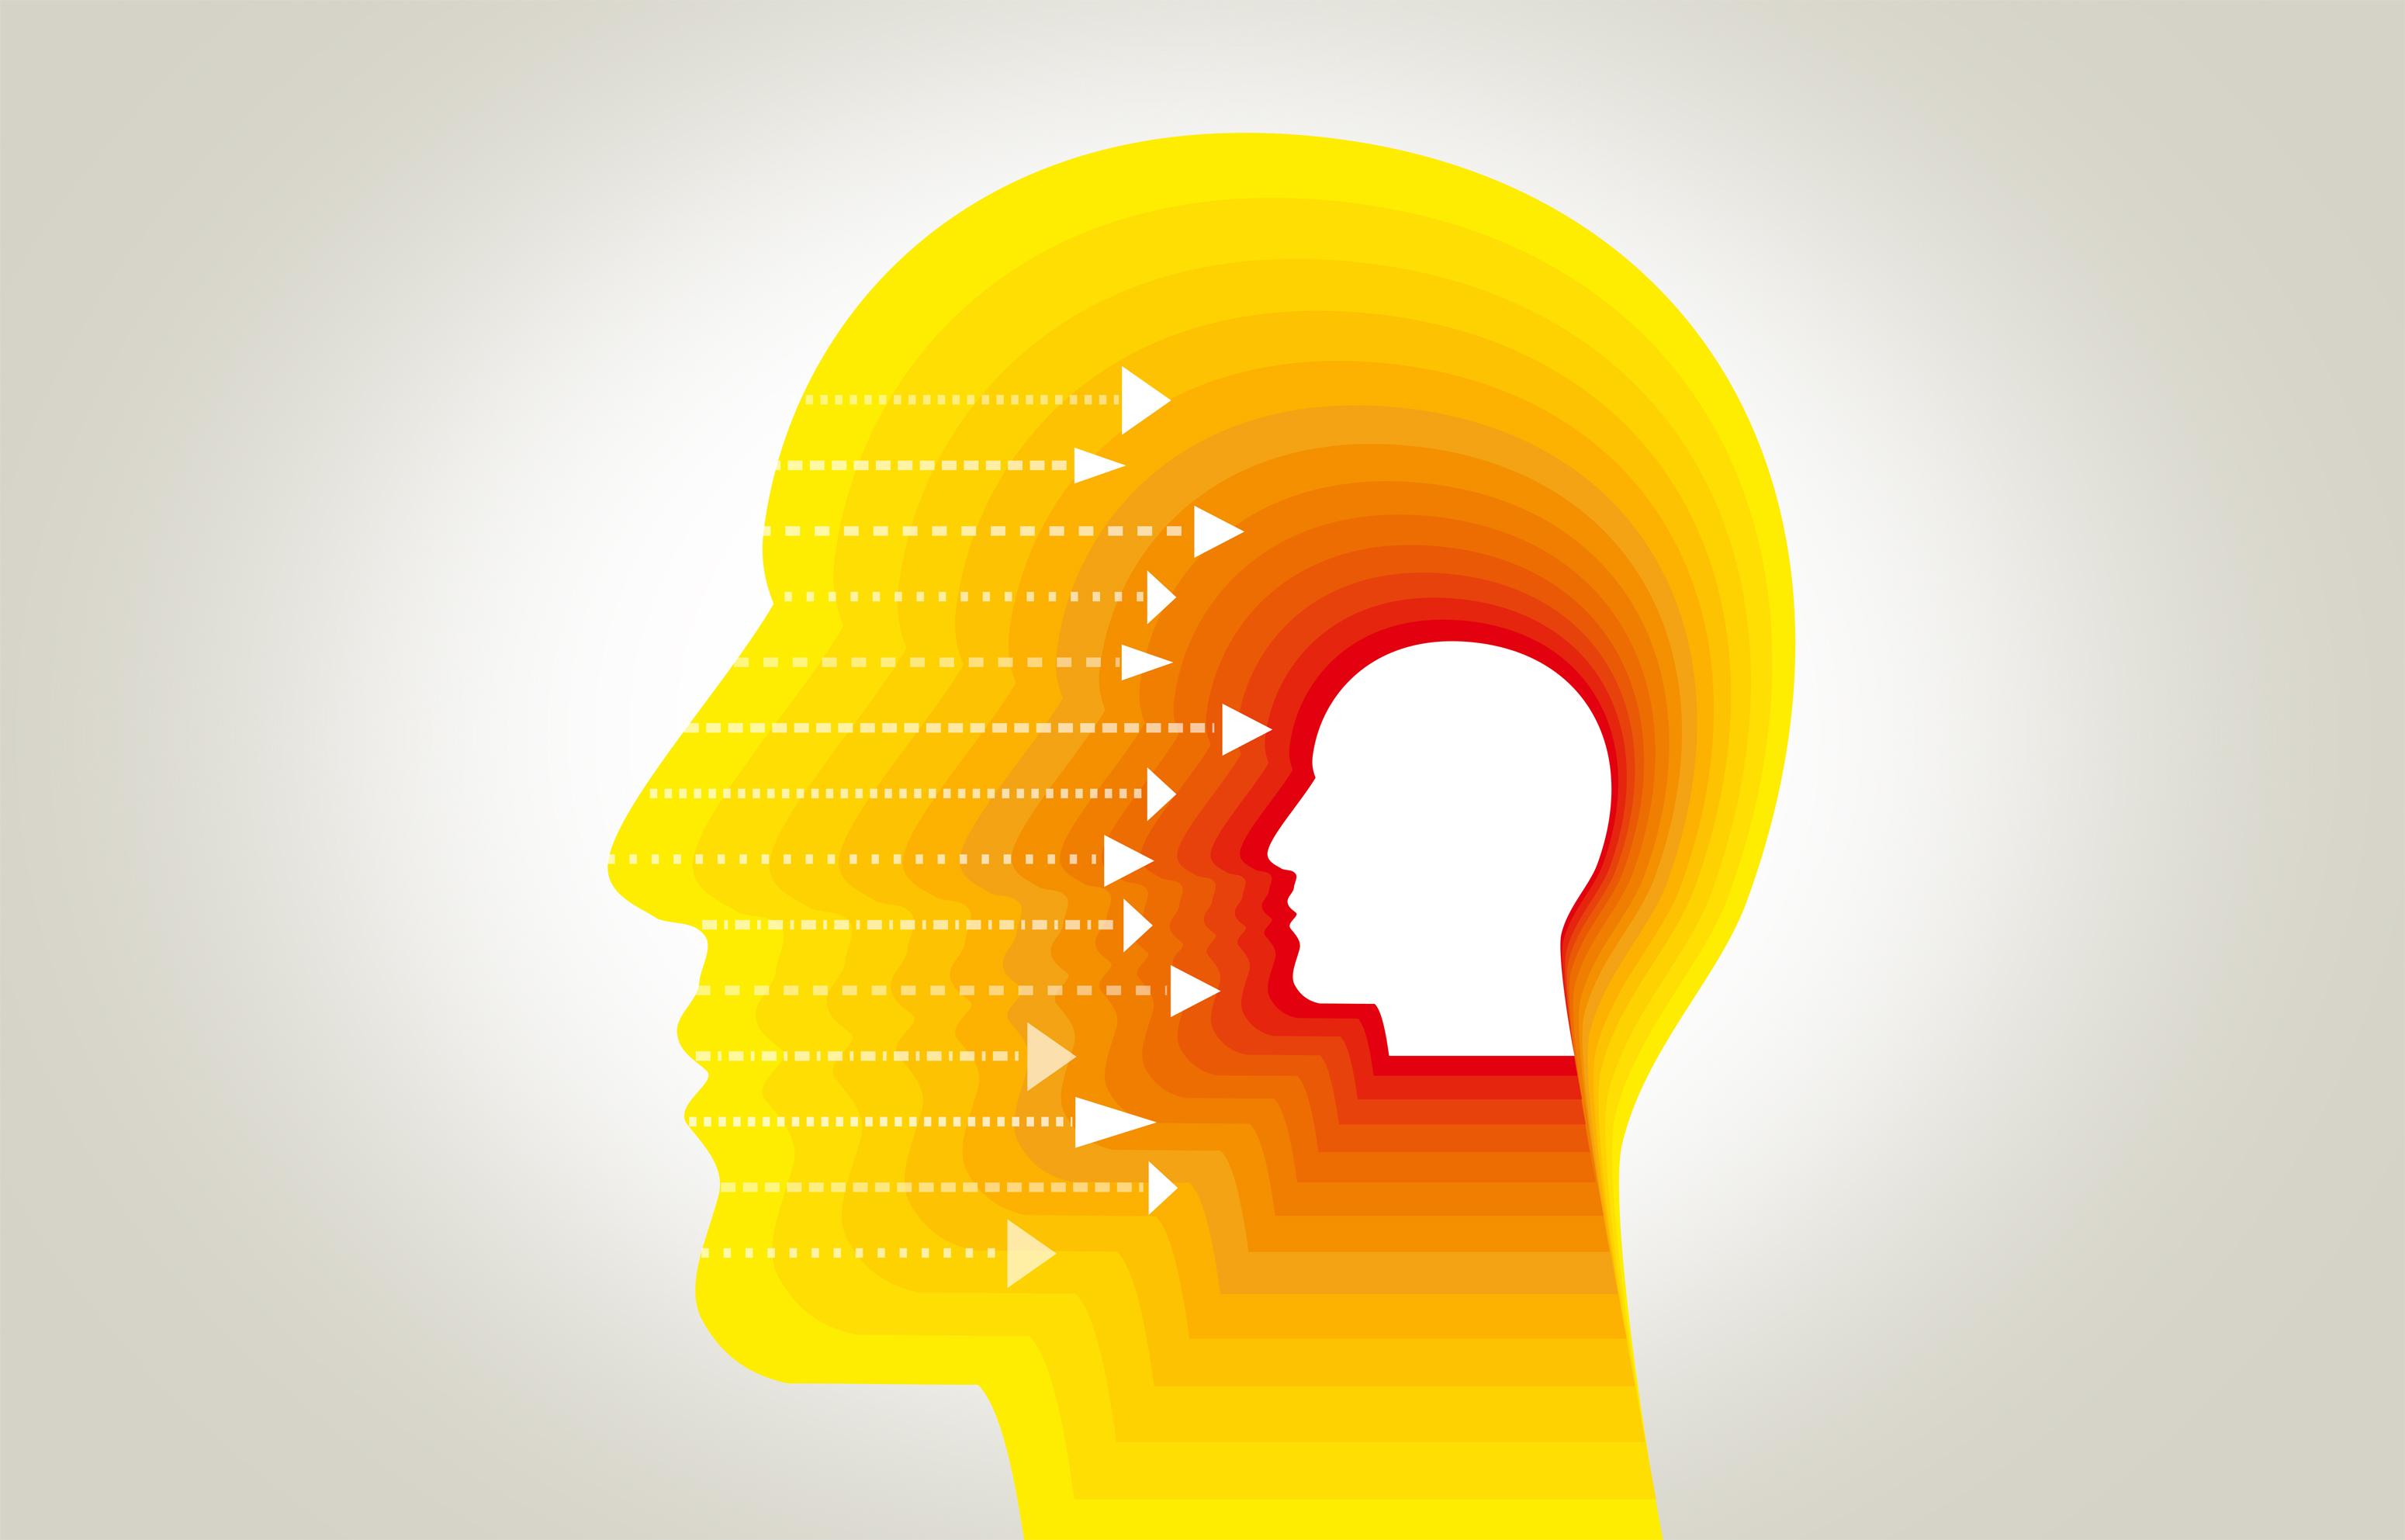 Environmental inputs to the brain - perception concept photo